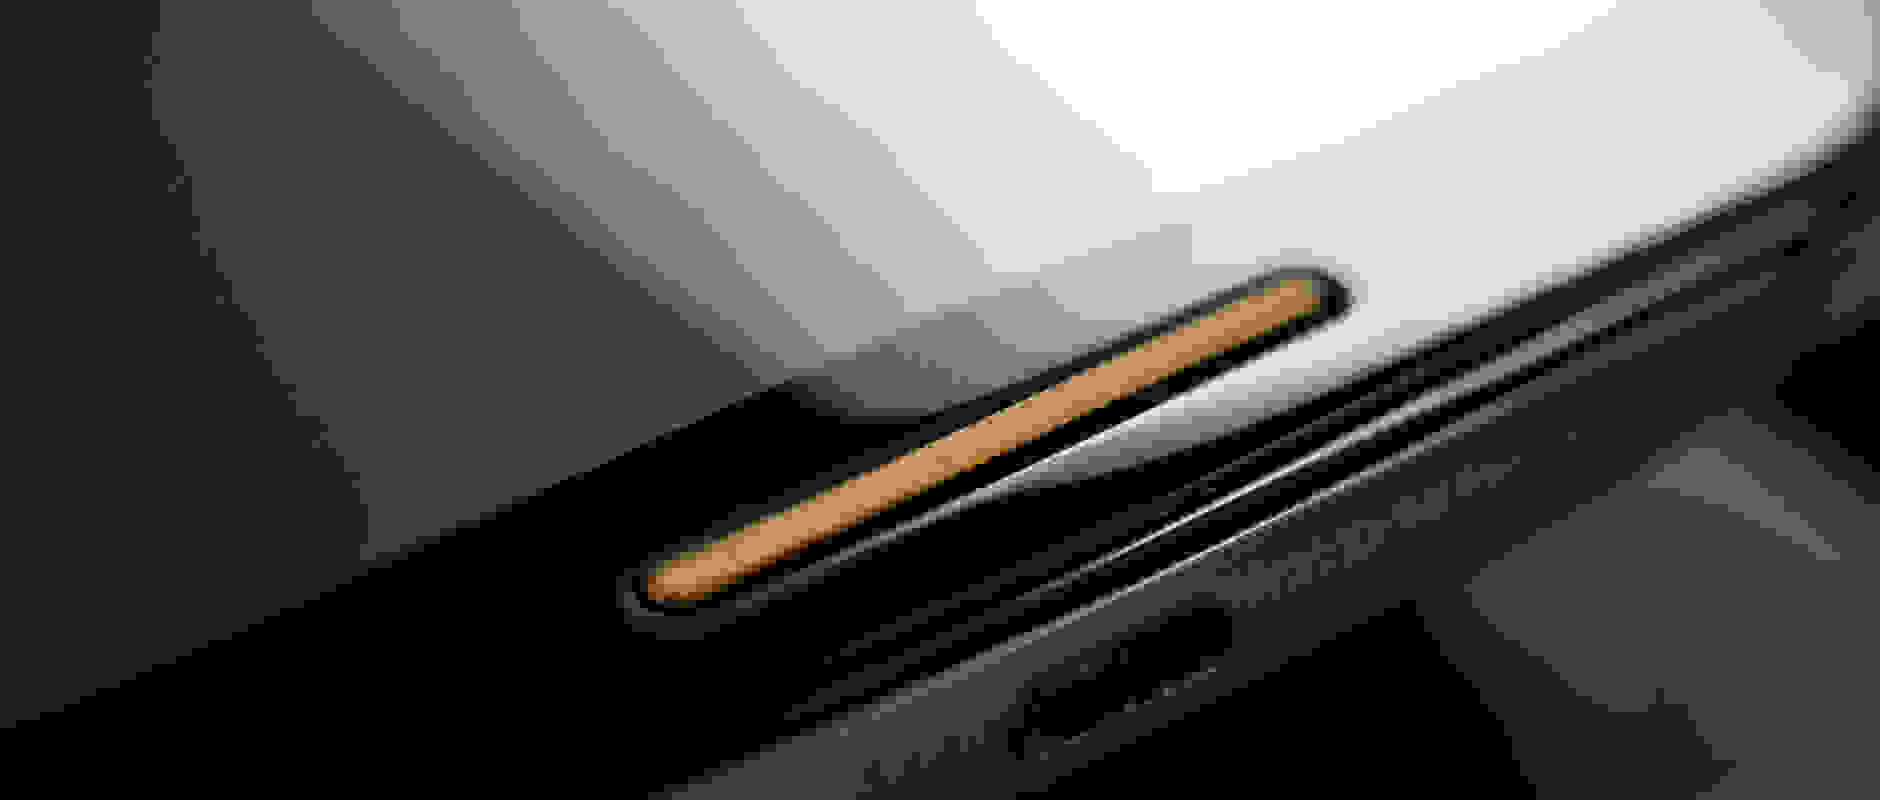 The speaker grille of the Motorola Moto X (2014 edition).